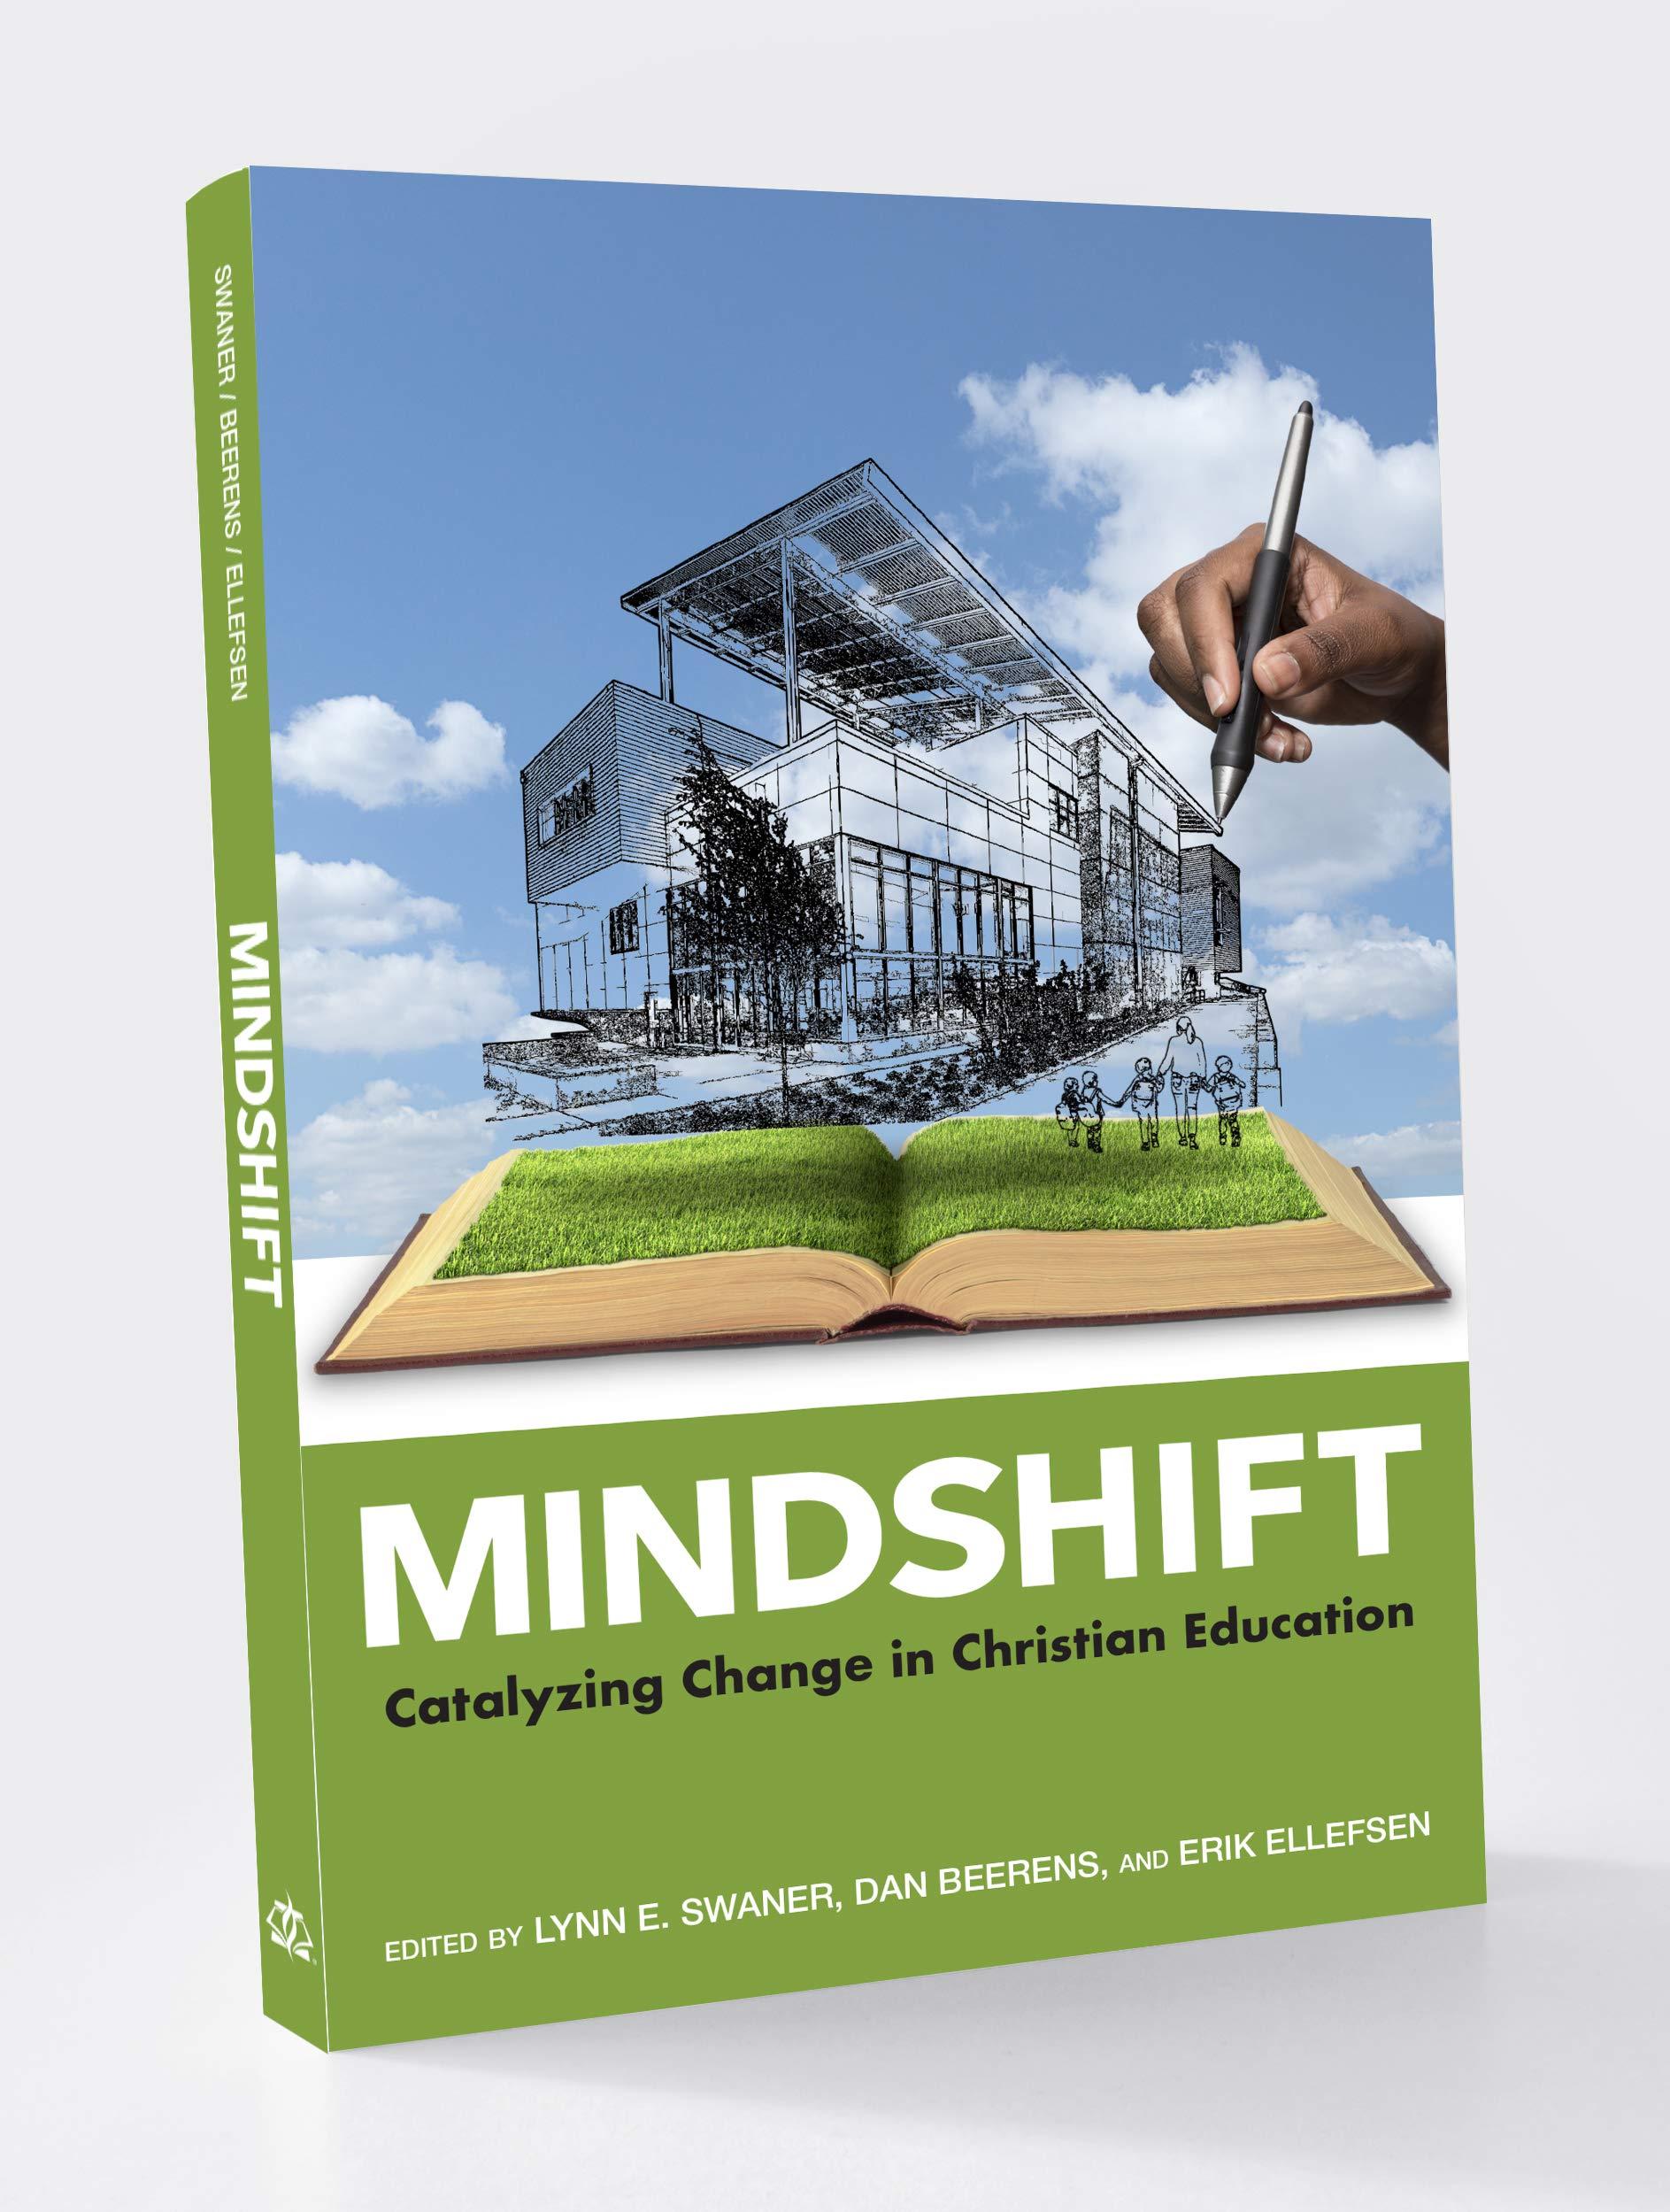 Amazon.com: MindShift (9781583315590): Lynn E. Swaner, Dan ...